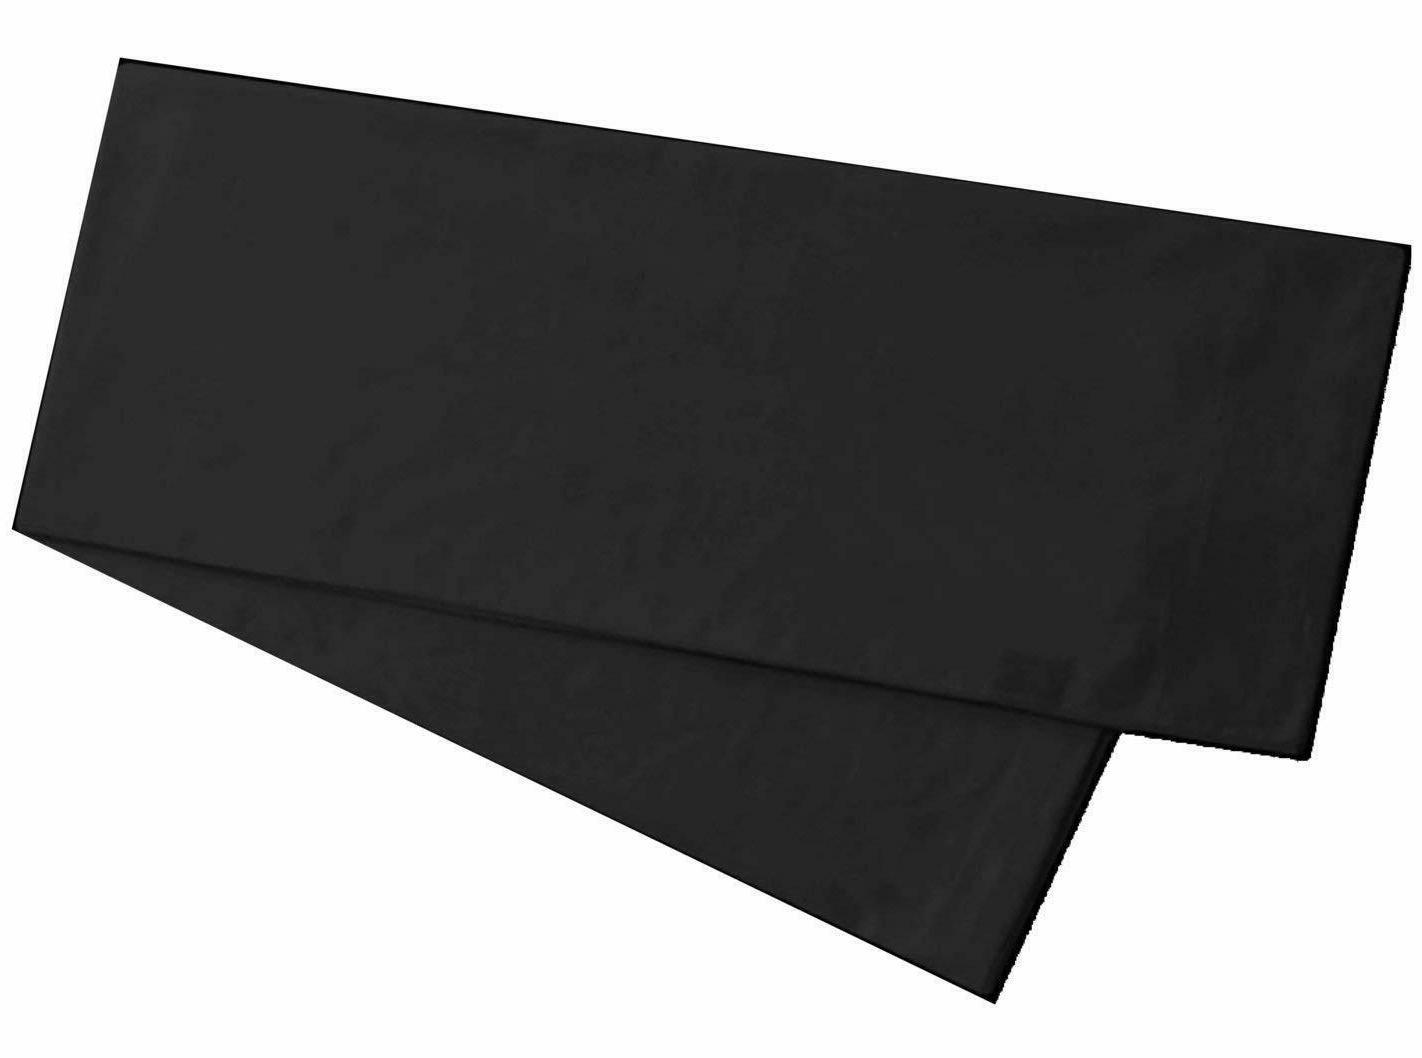 Body Pillow 20 x 54, 100% Cotton, 300 Thread Body